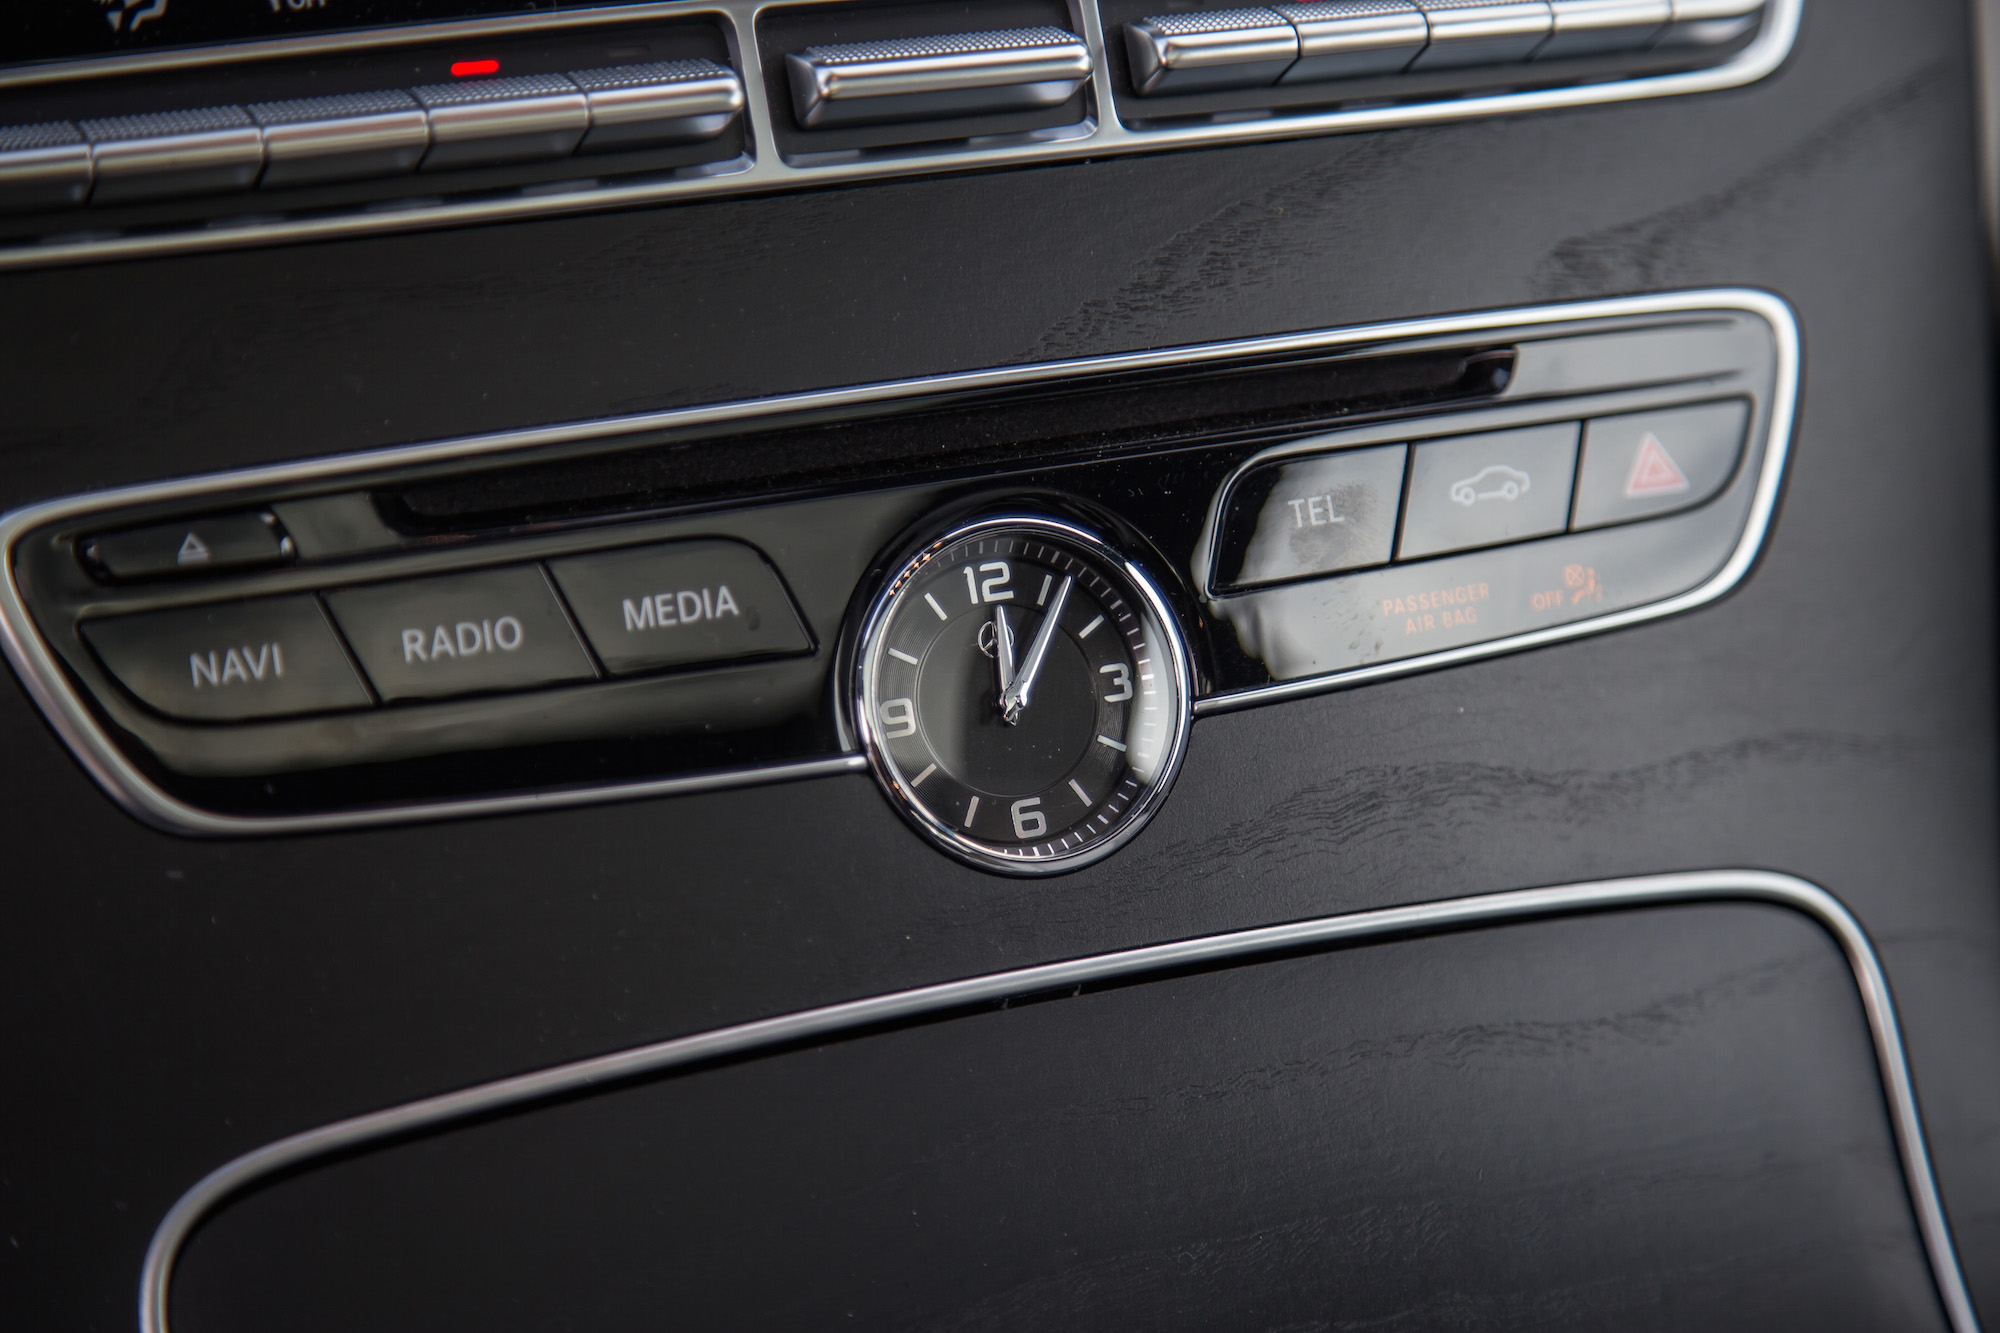 Auto Paint Store >> Review: 2017 Mercedes-Benz C 300 4MATIC Coupe | Canadian Auto Review